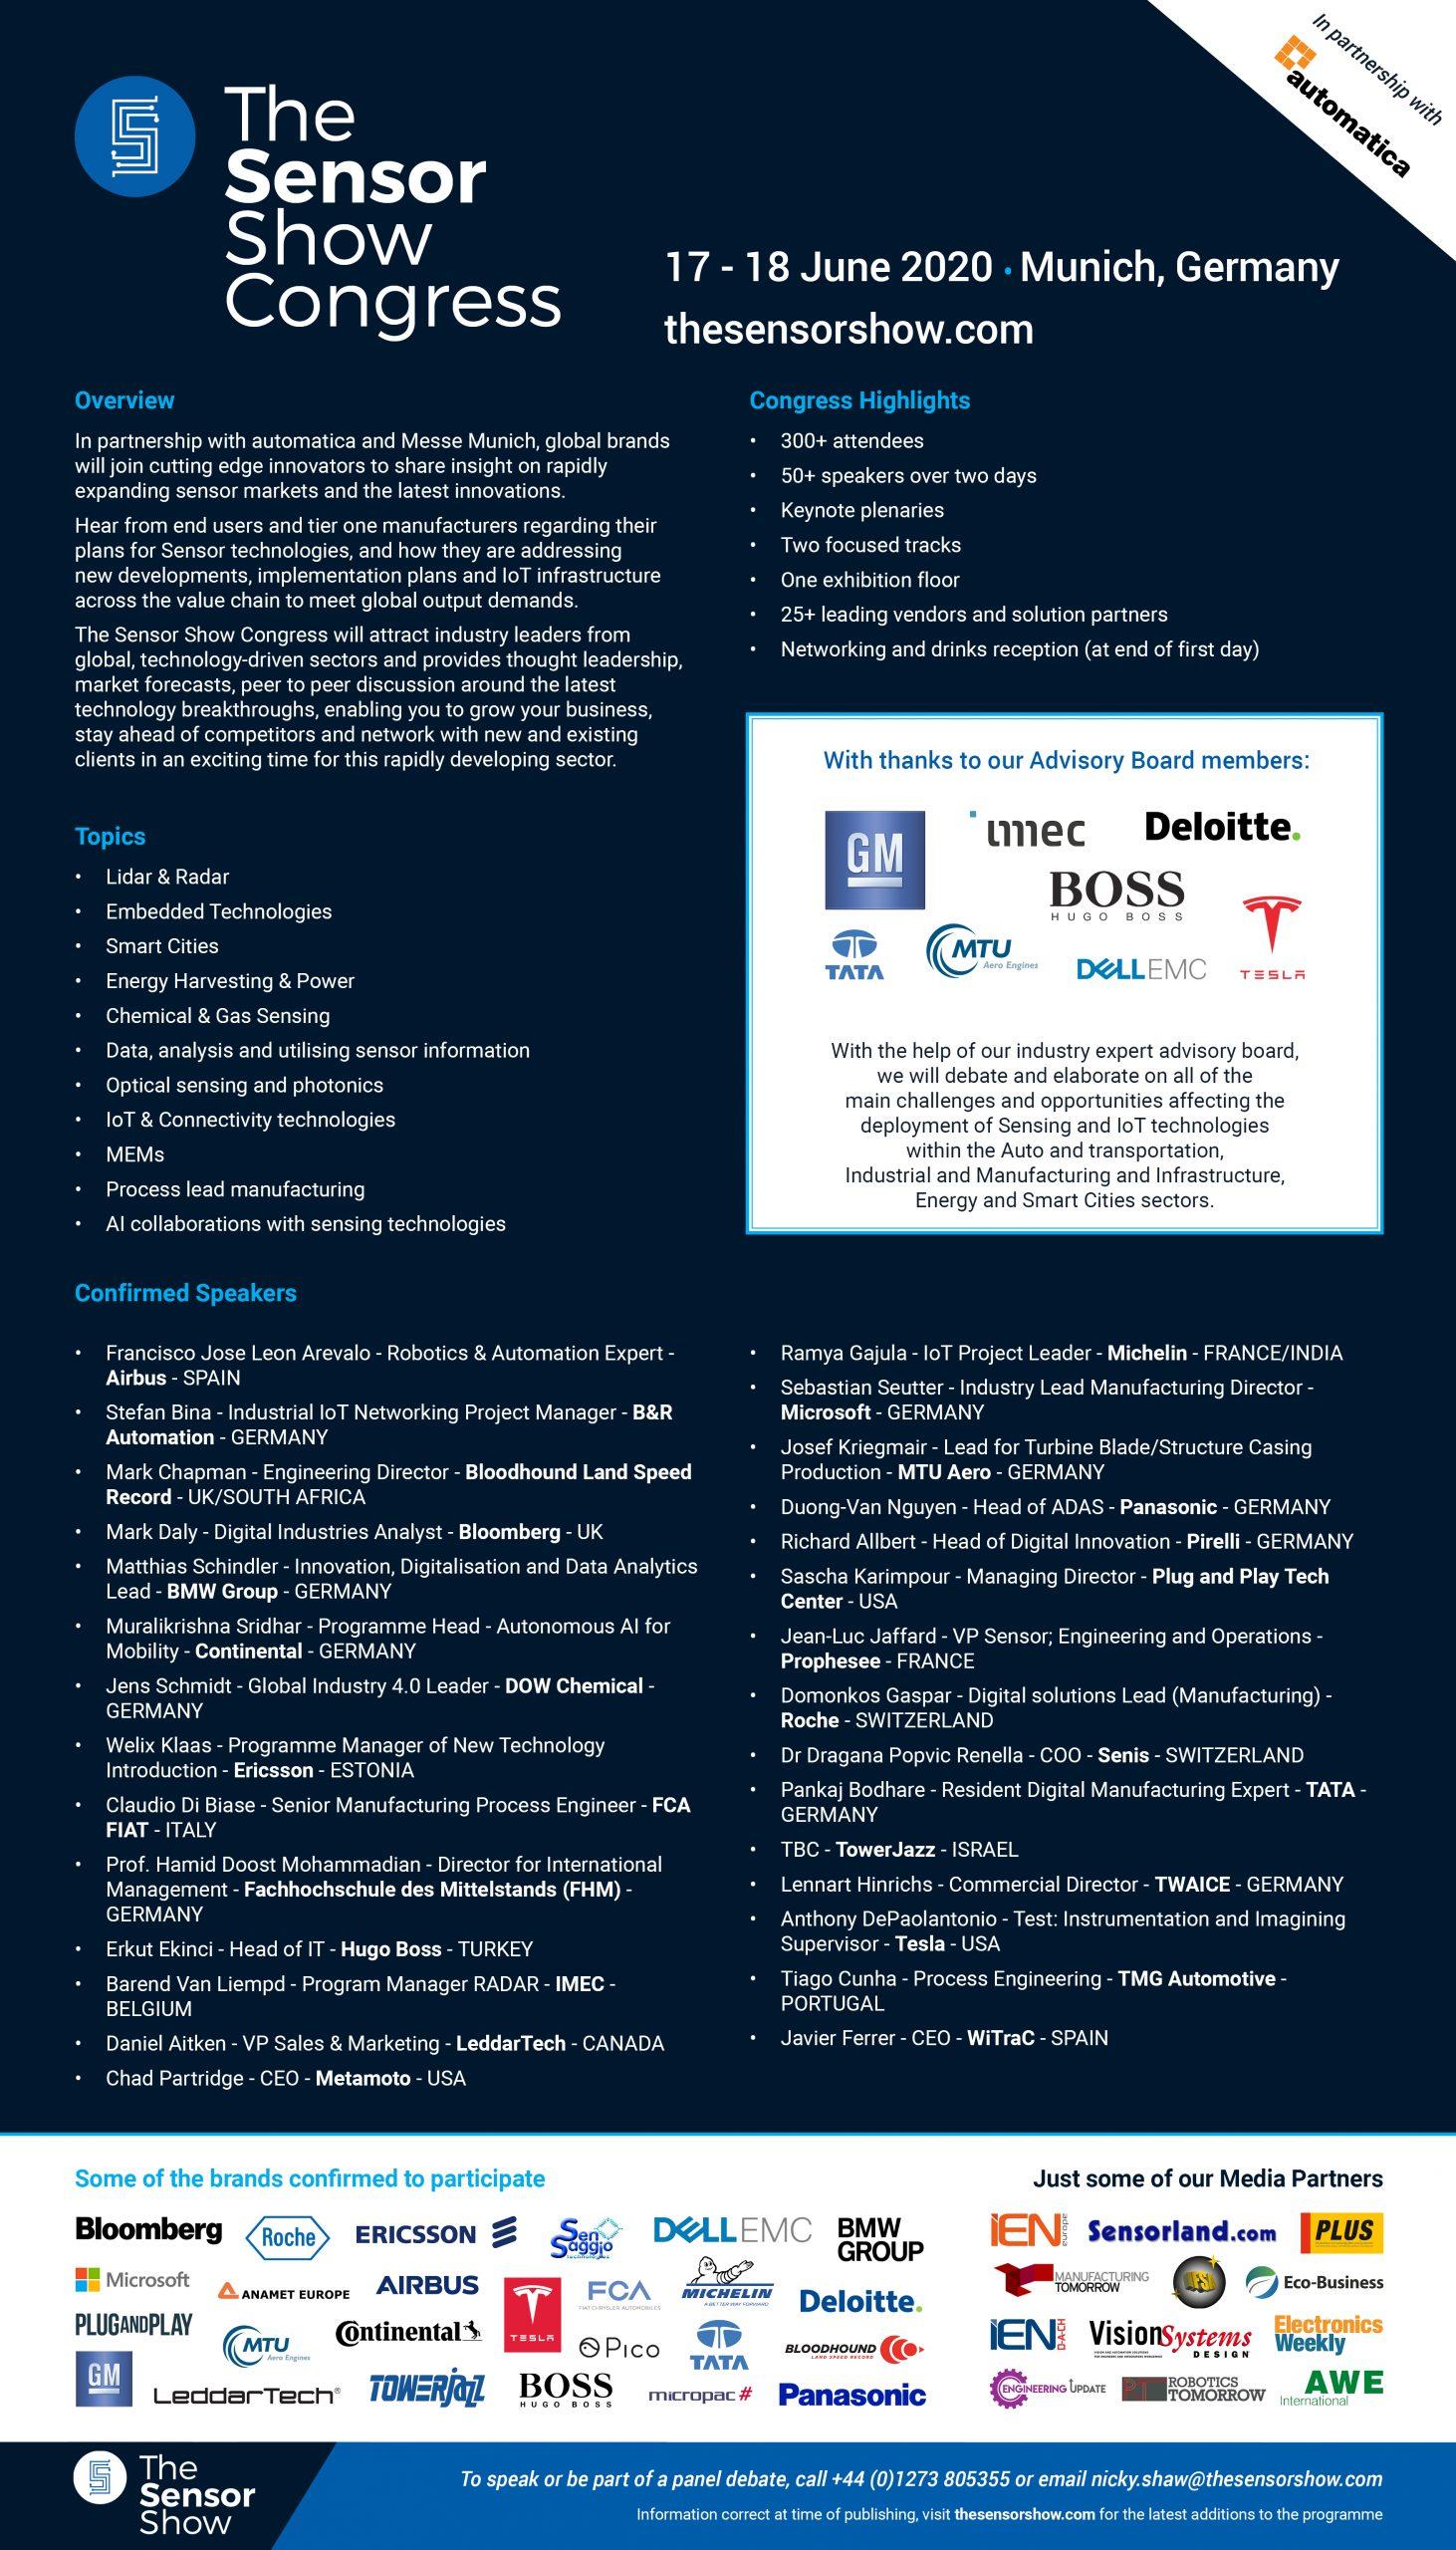 The Sensor Show Congress Munich - Agenda - 17.01.2020 - 4